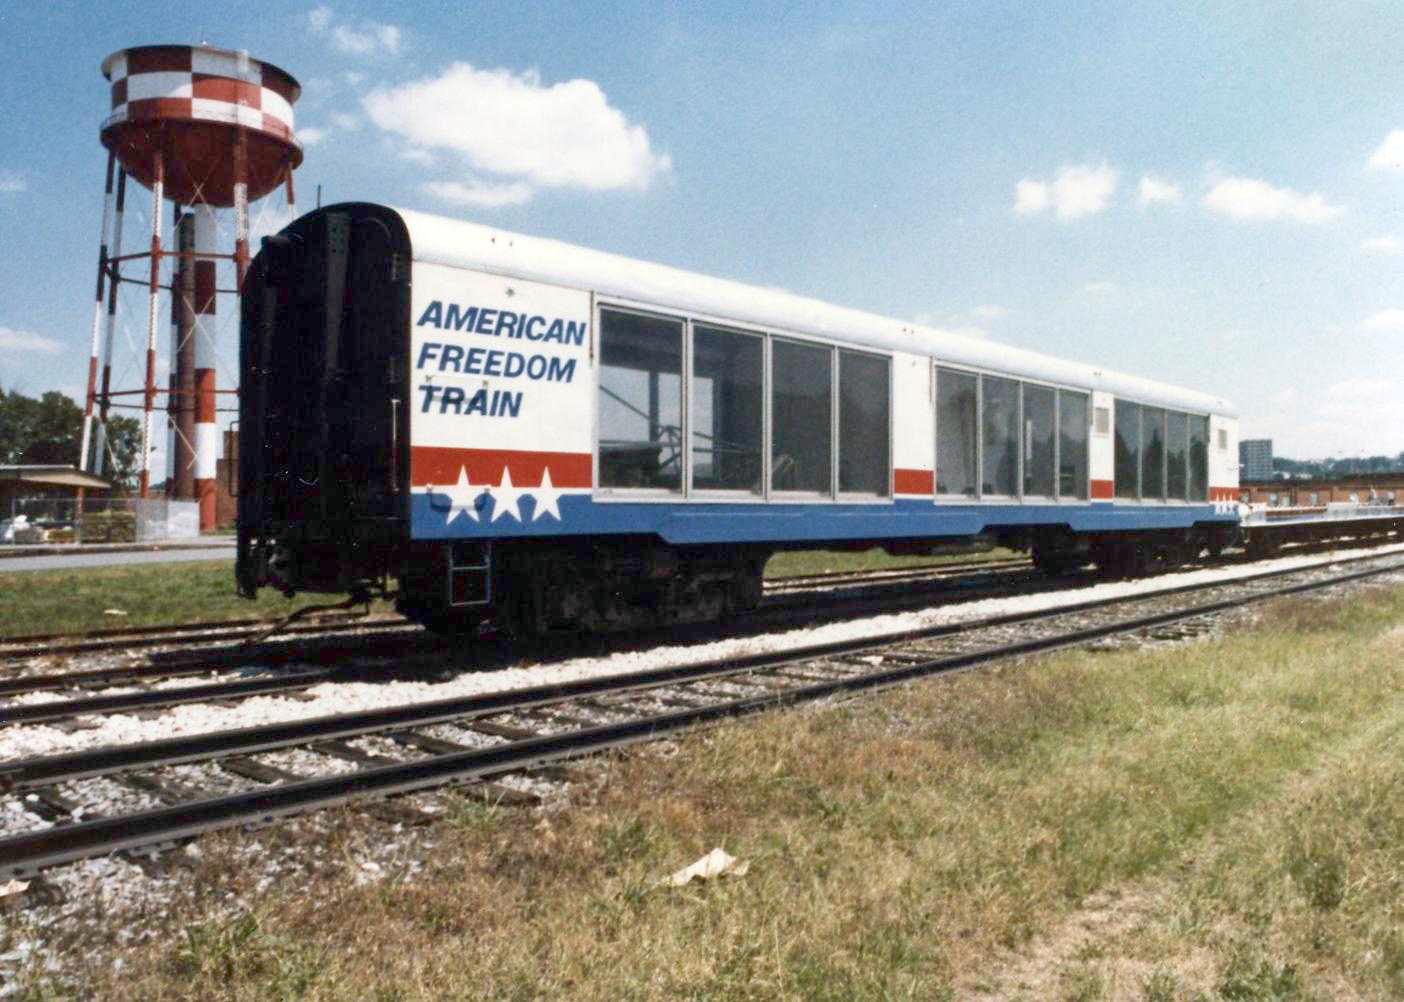 american freedom train 1976 - photo #12